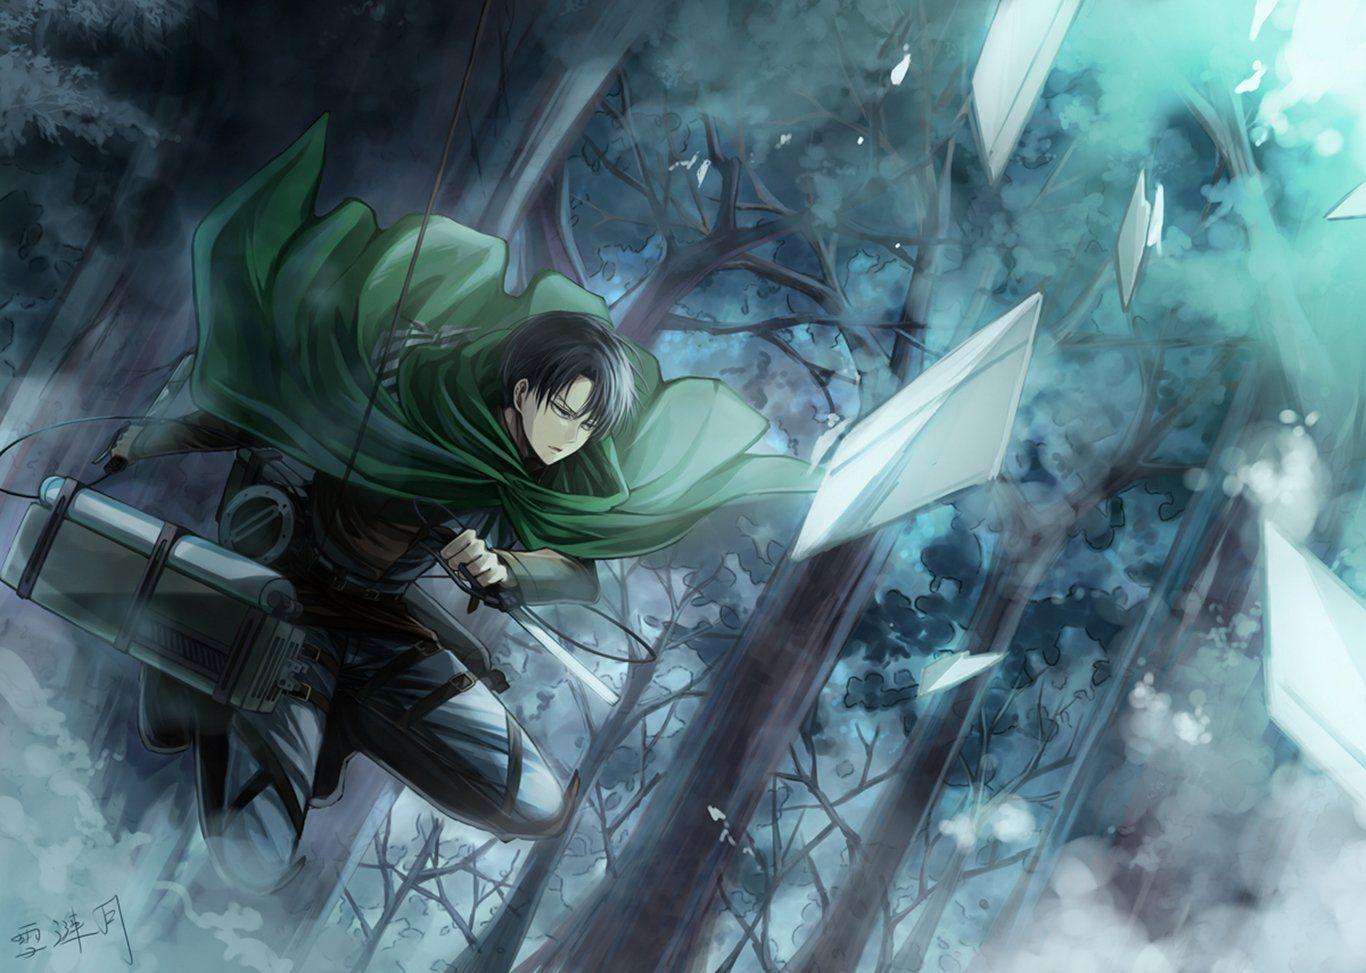 Anime Attack On Titan Attack On Titan Levi Ackerman Wallpaper Attack On Titan Levi Attack On Titan Art Attack On Titan